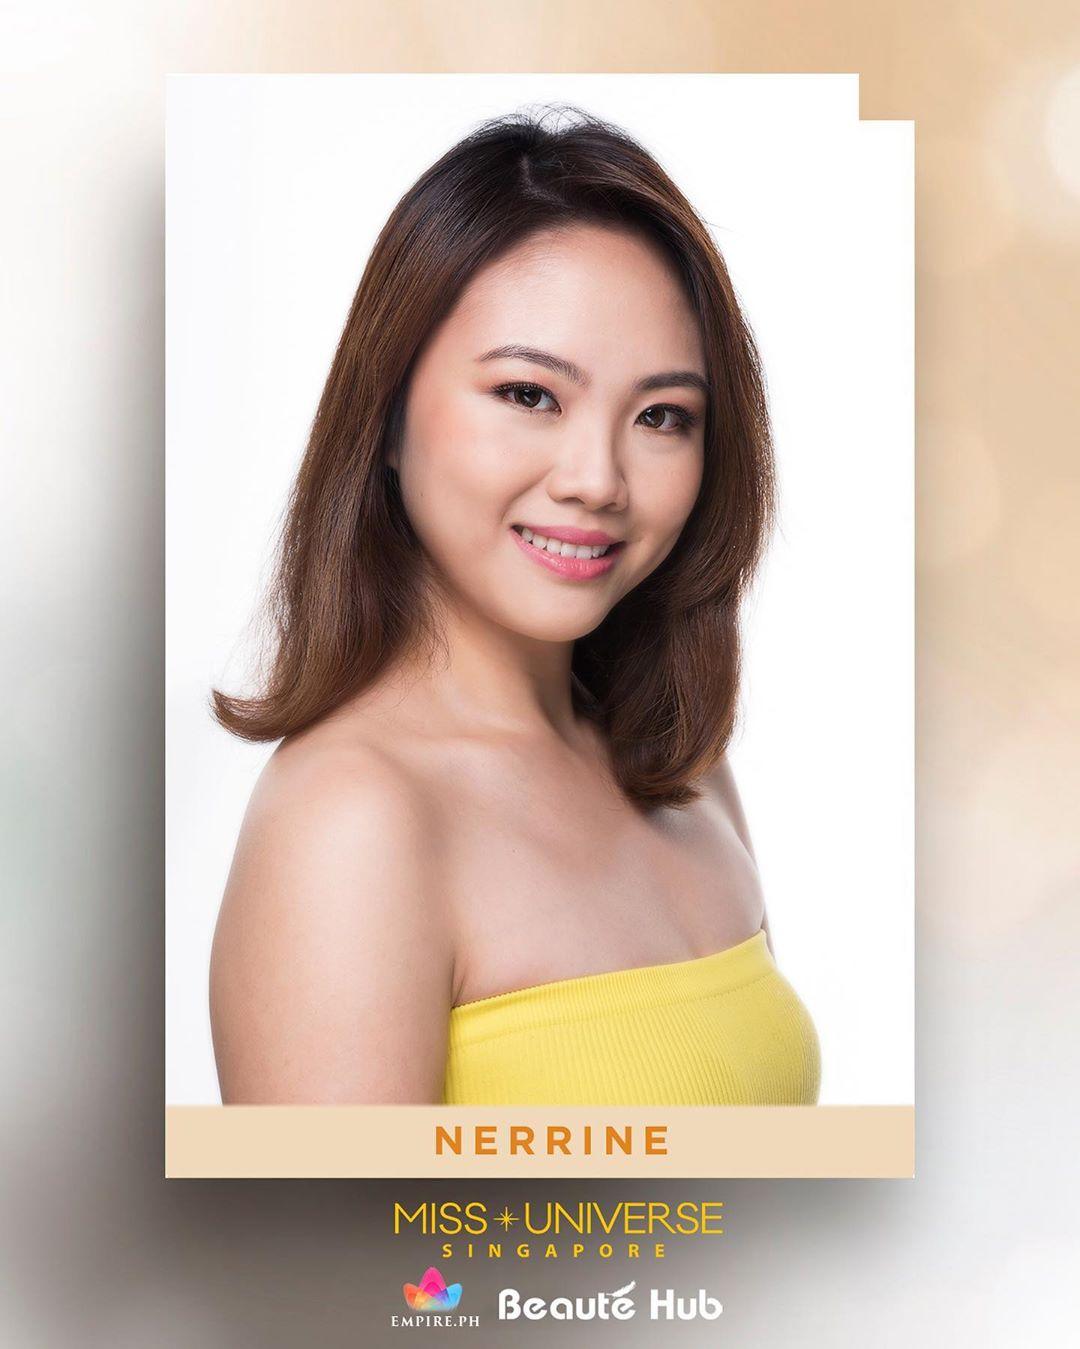 candidatas a miss universe singapore 2019. final: 17 oct. Hu2rumwh